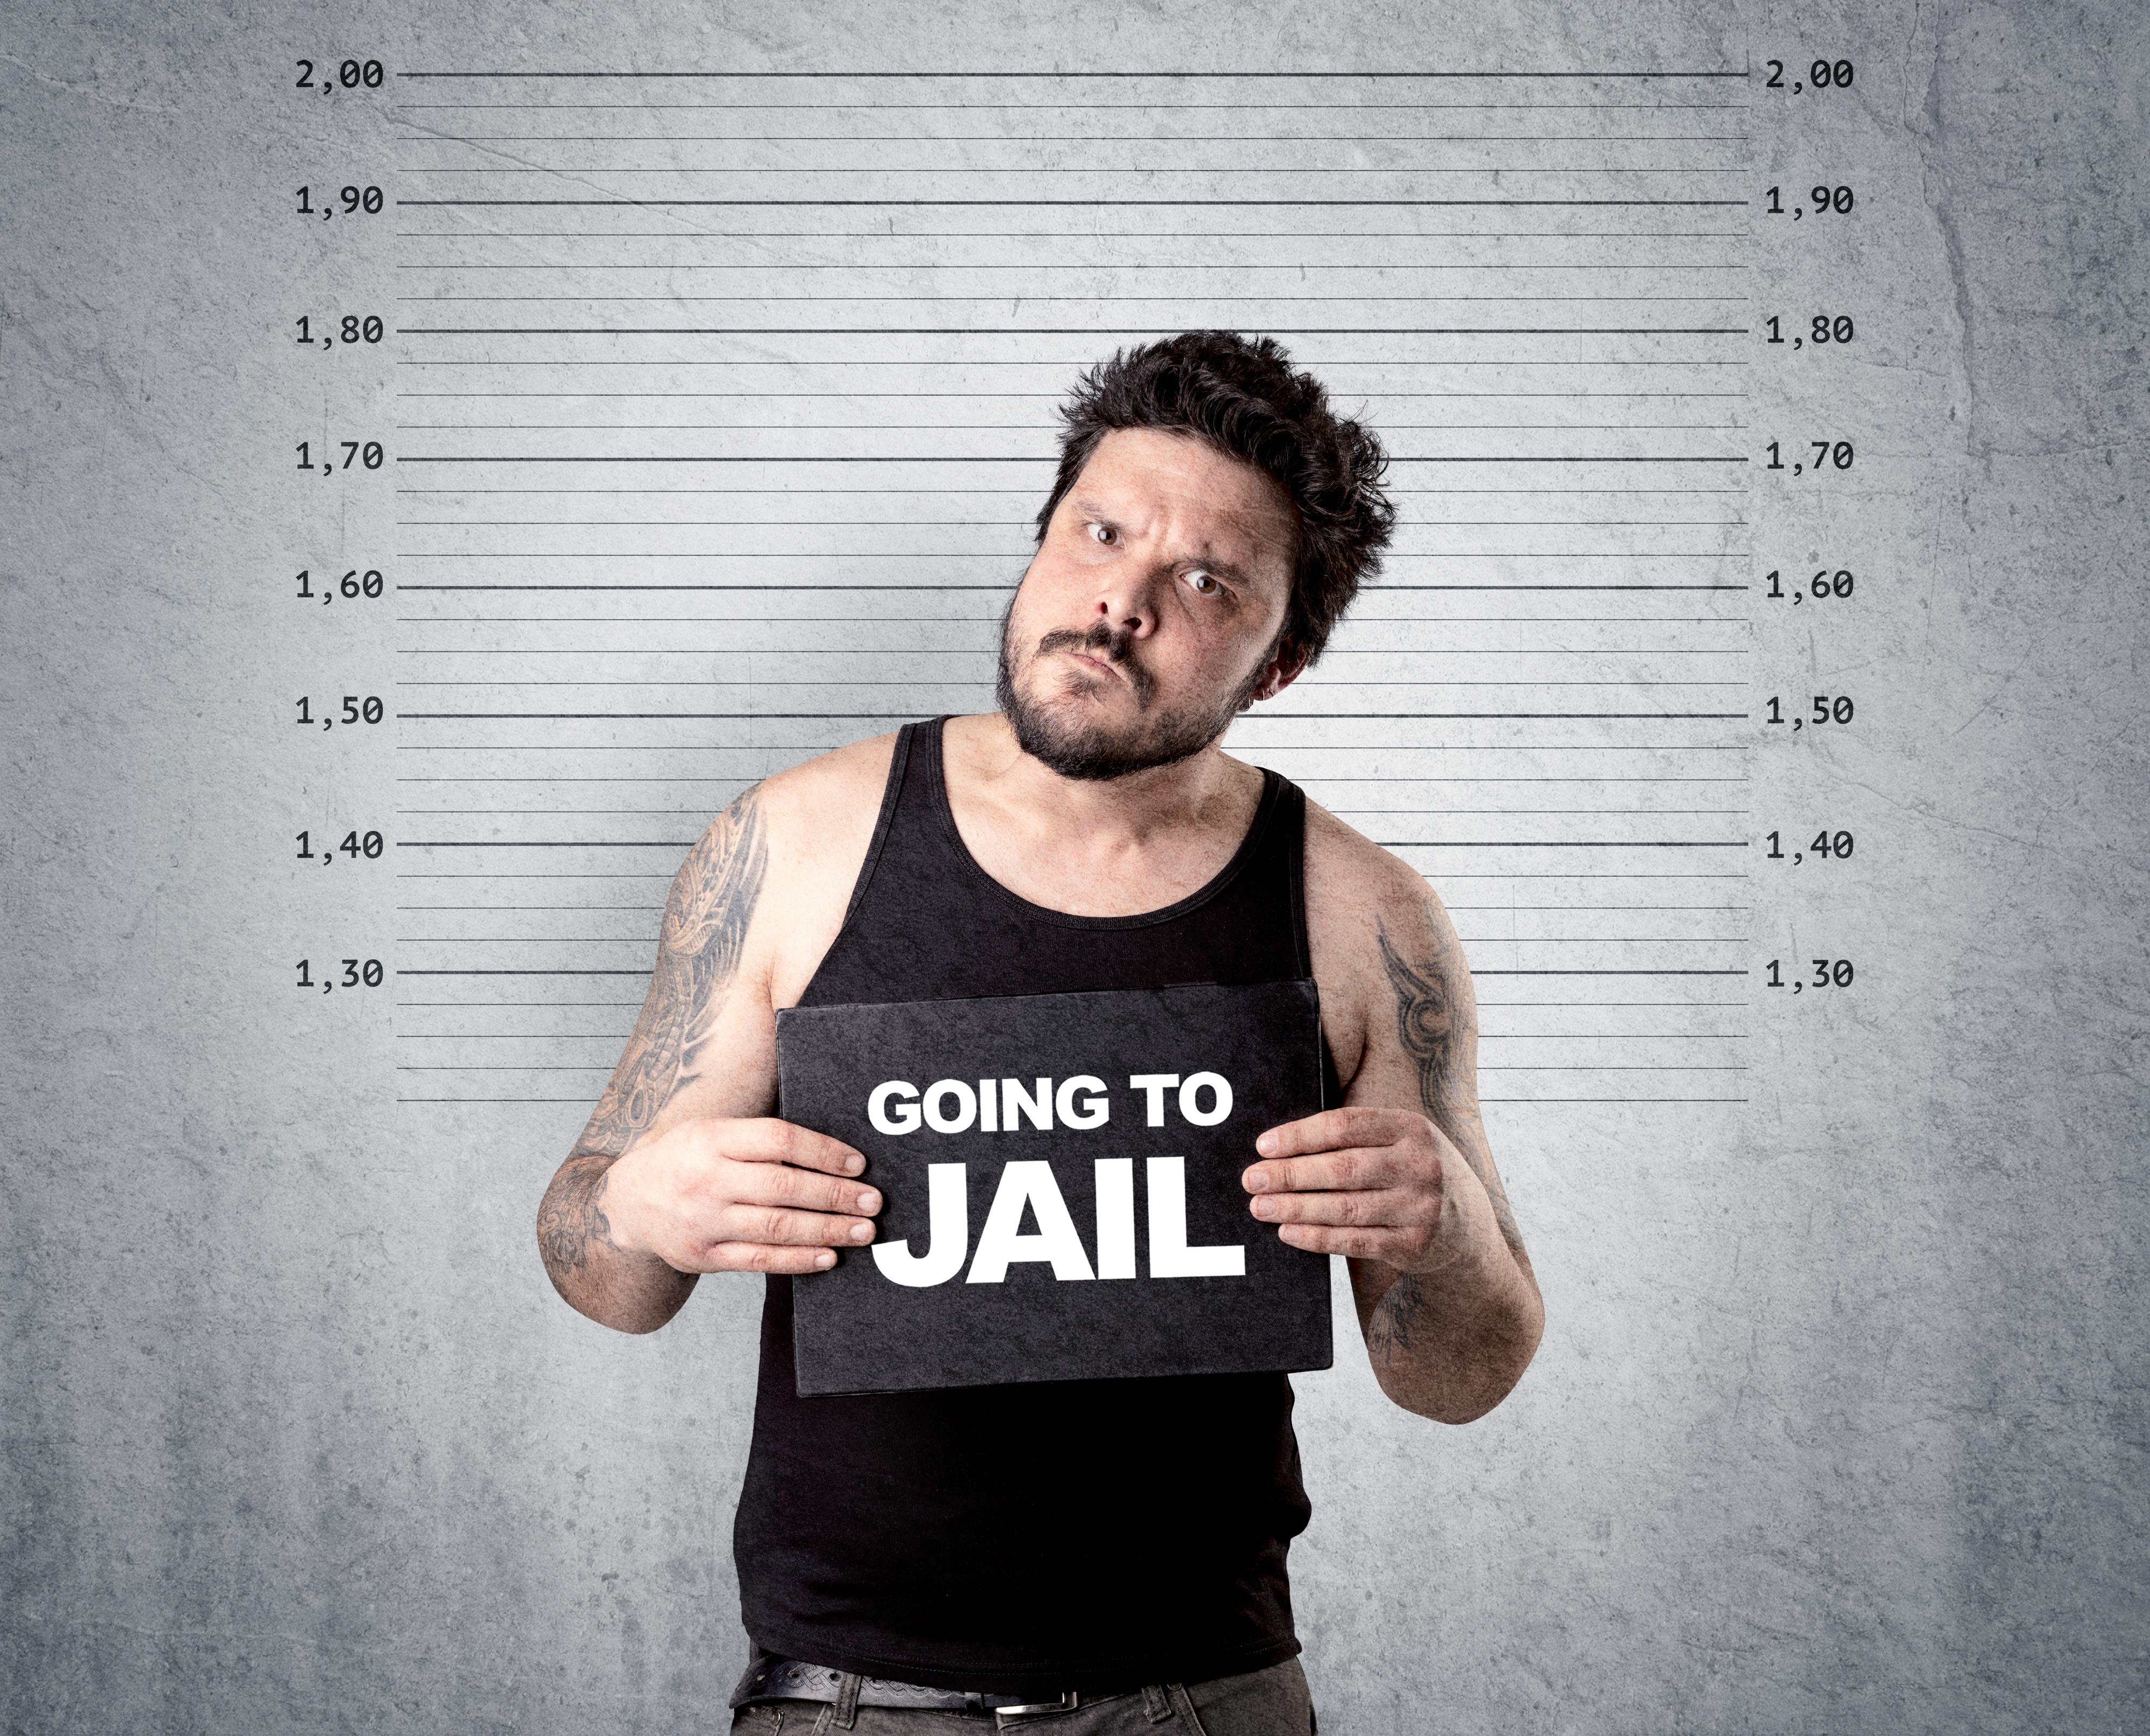 How to Find Jail Mugshots, Online Mugshots